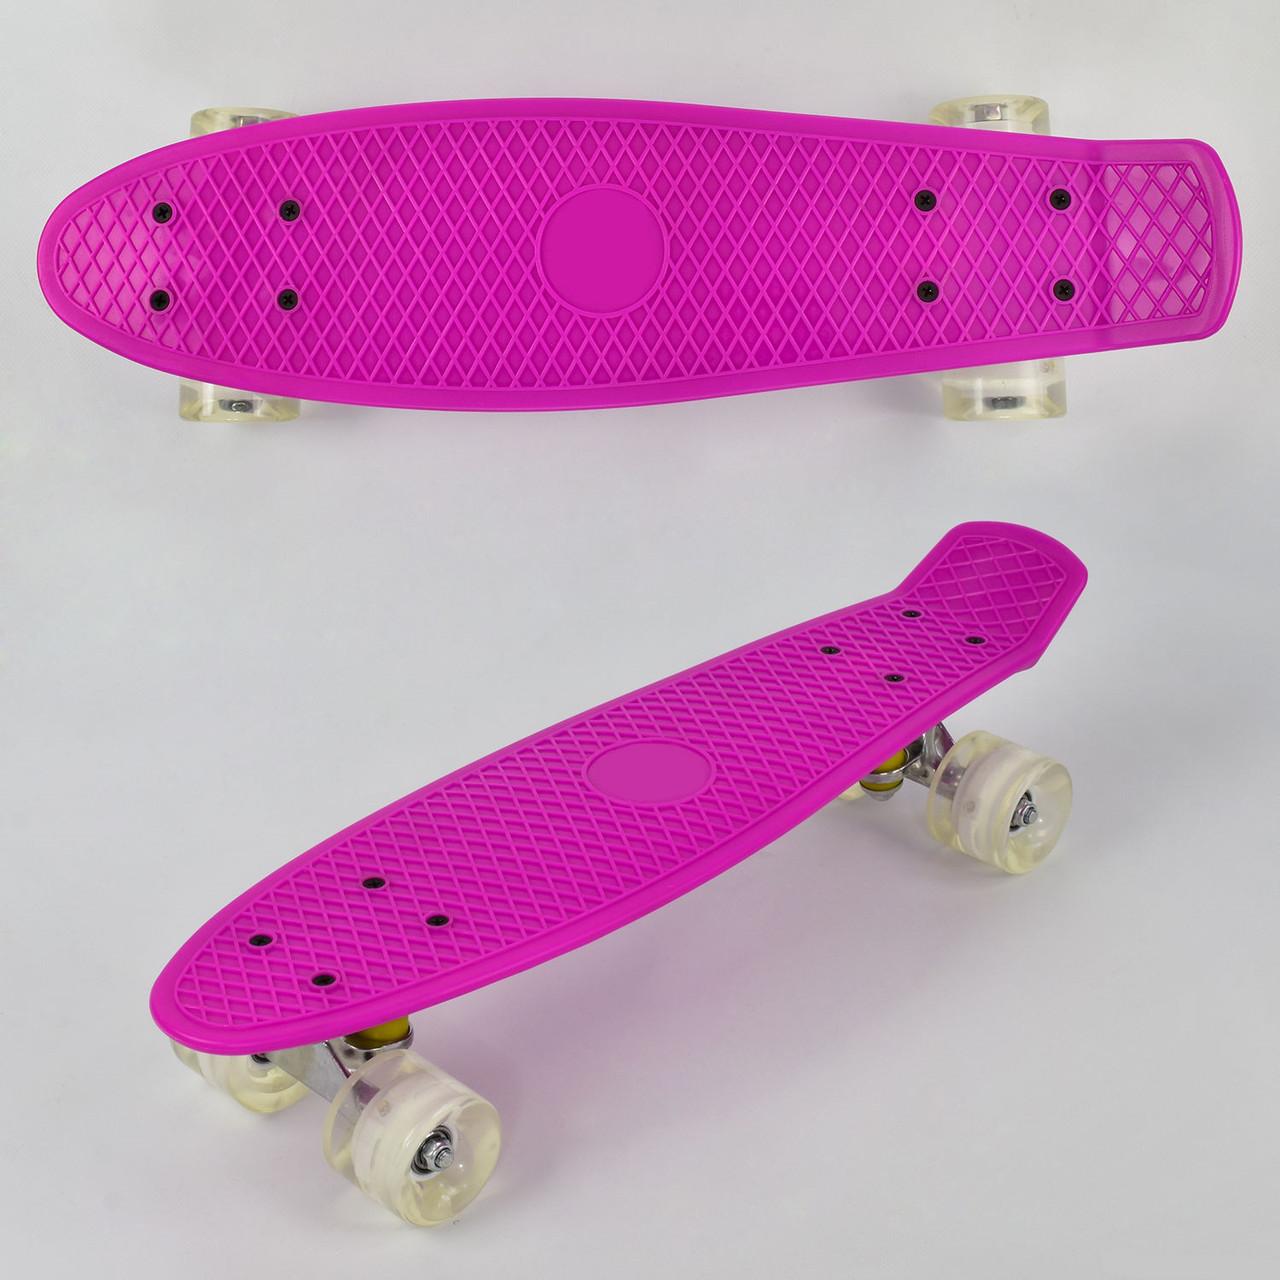 Скейт Пенни Борд (Penny Board) со светящими колесами. 22 дюйма. Розовый